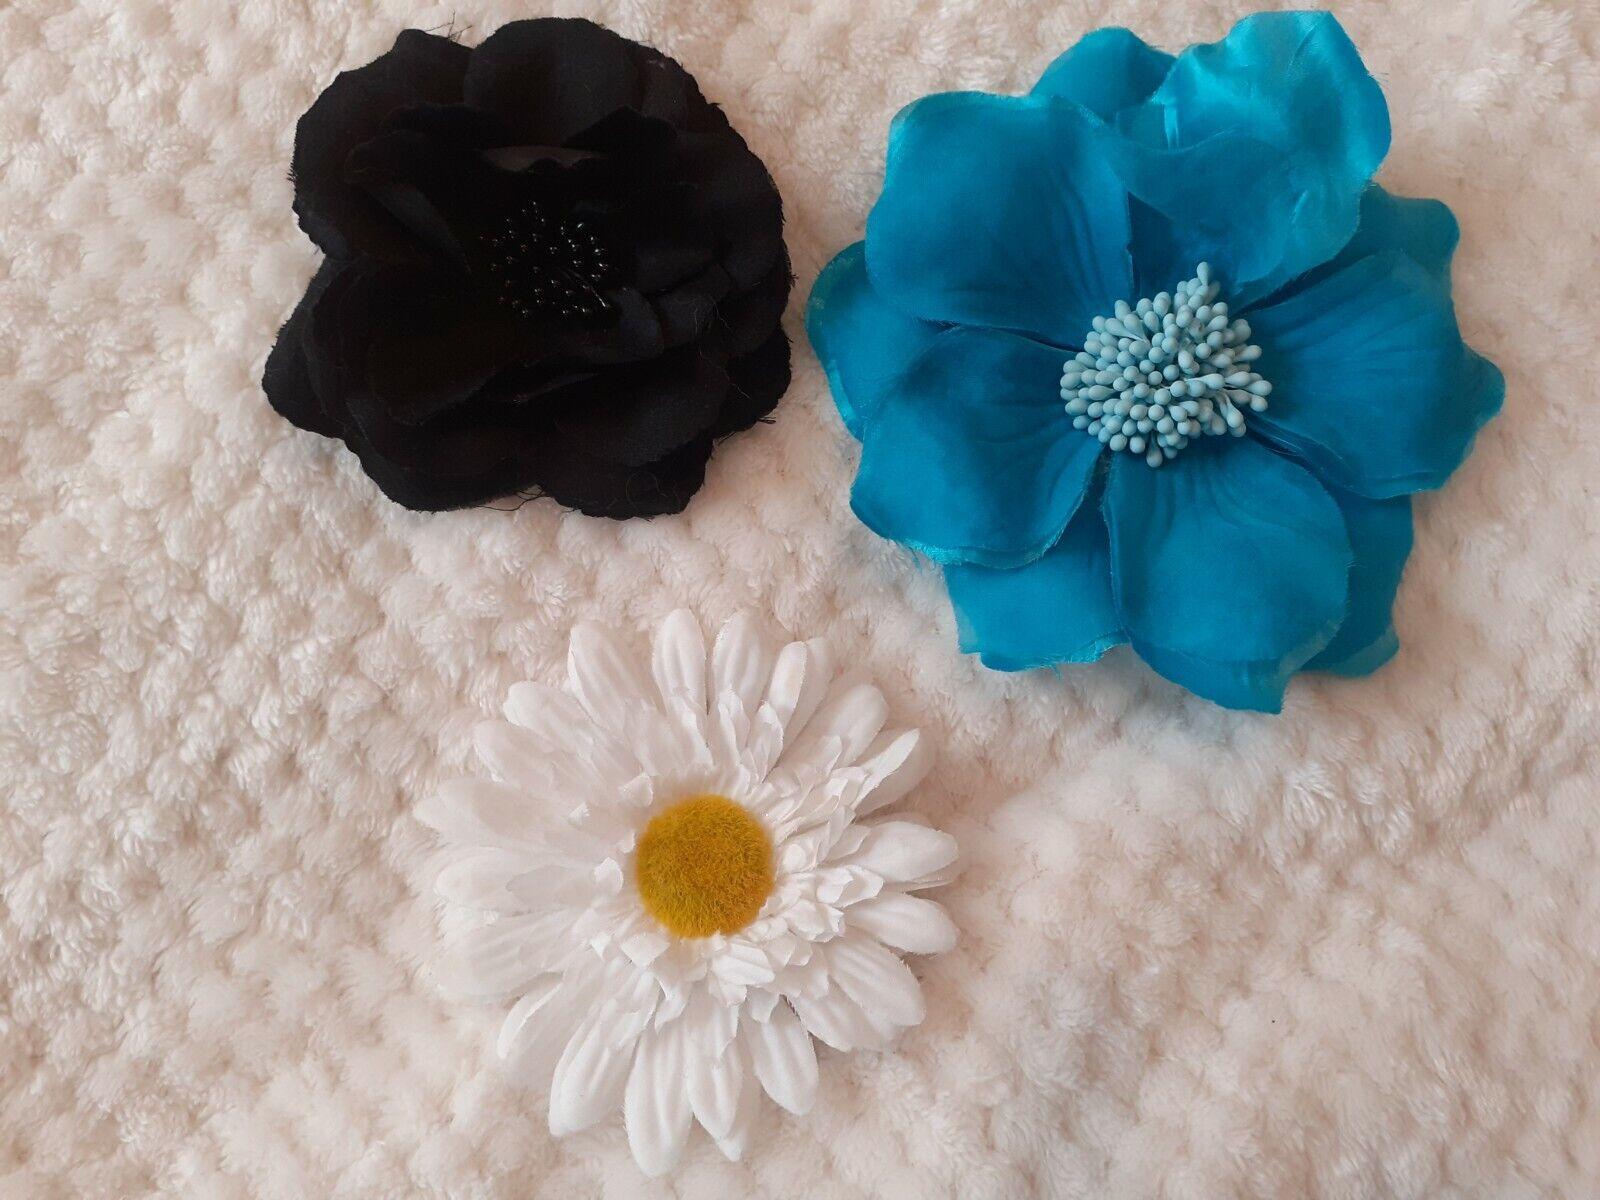 Flower clip on accessories